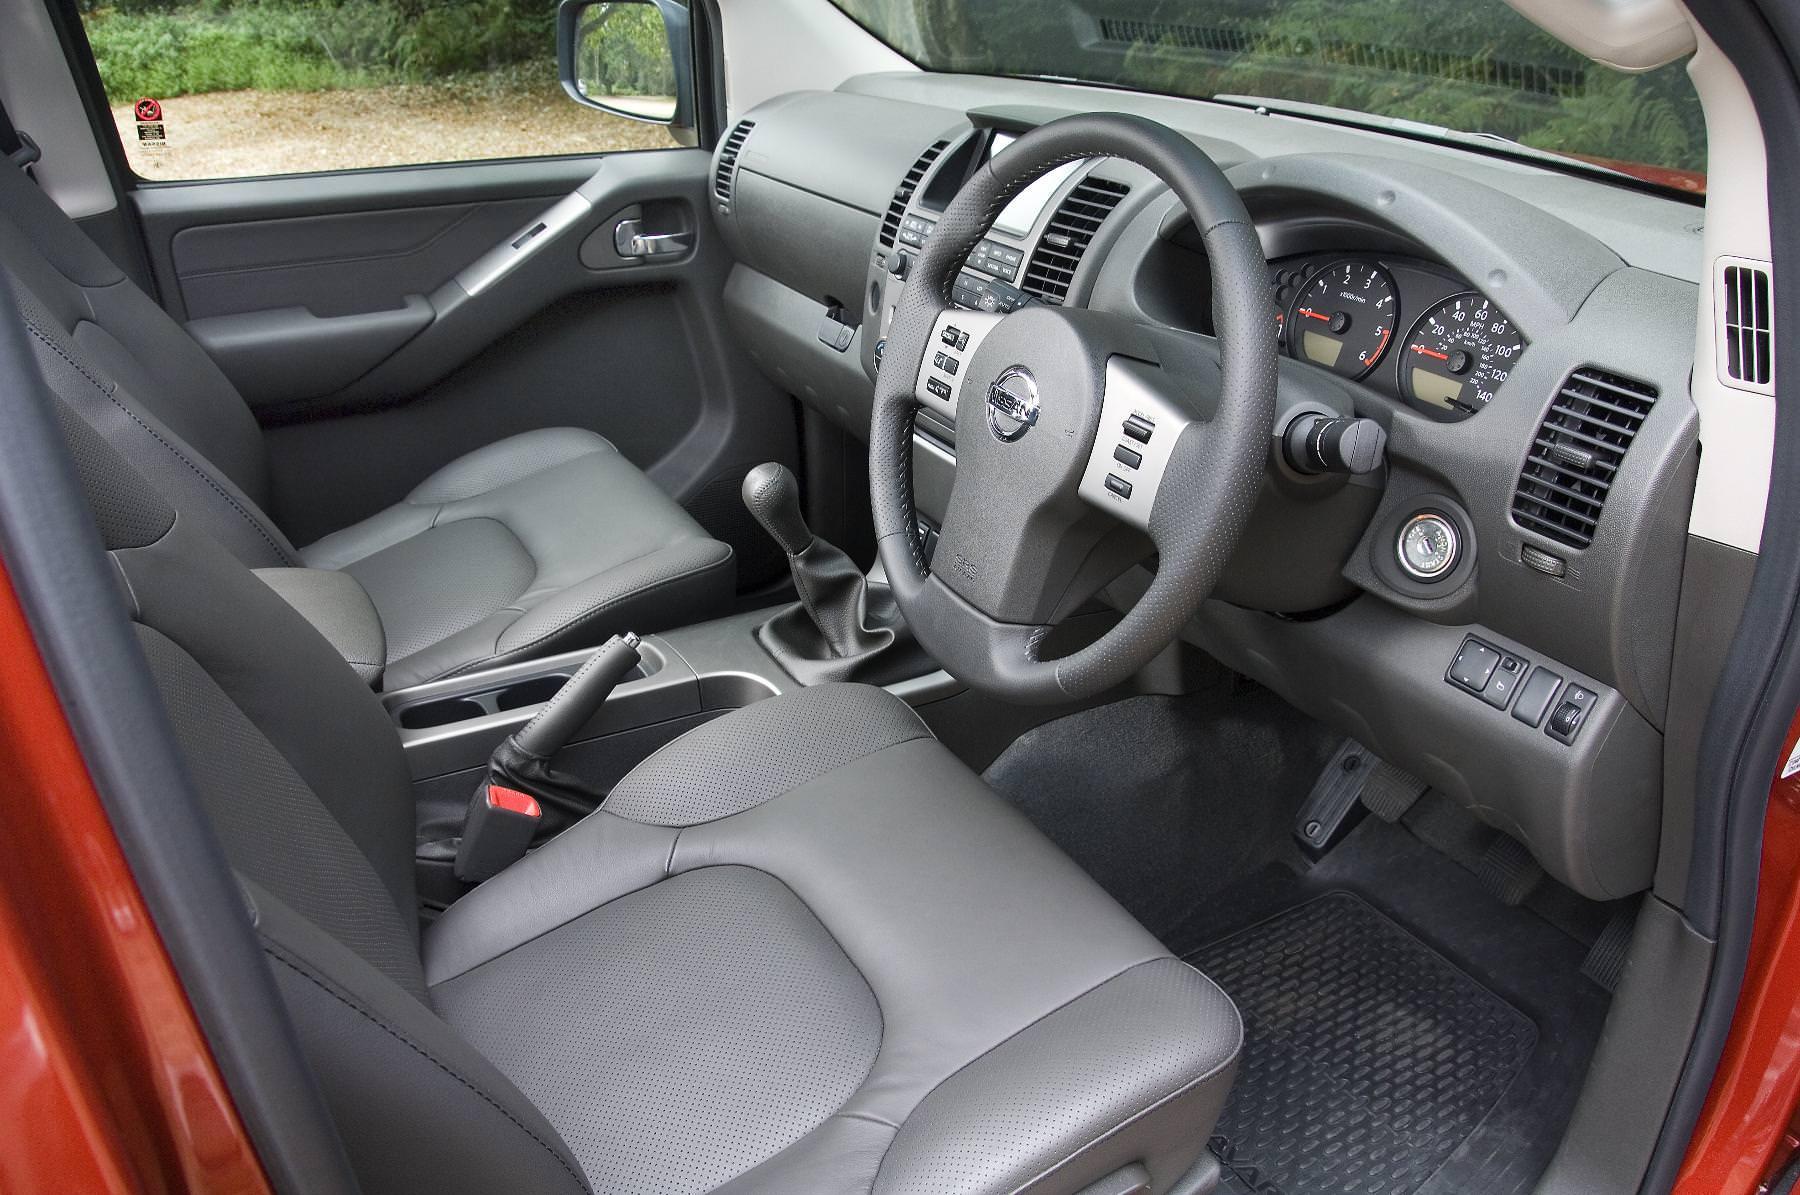 Nissan Navara drivers seat interior